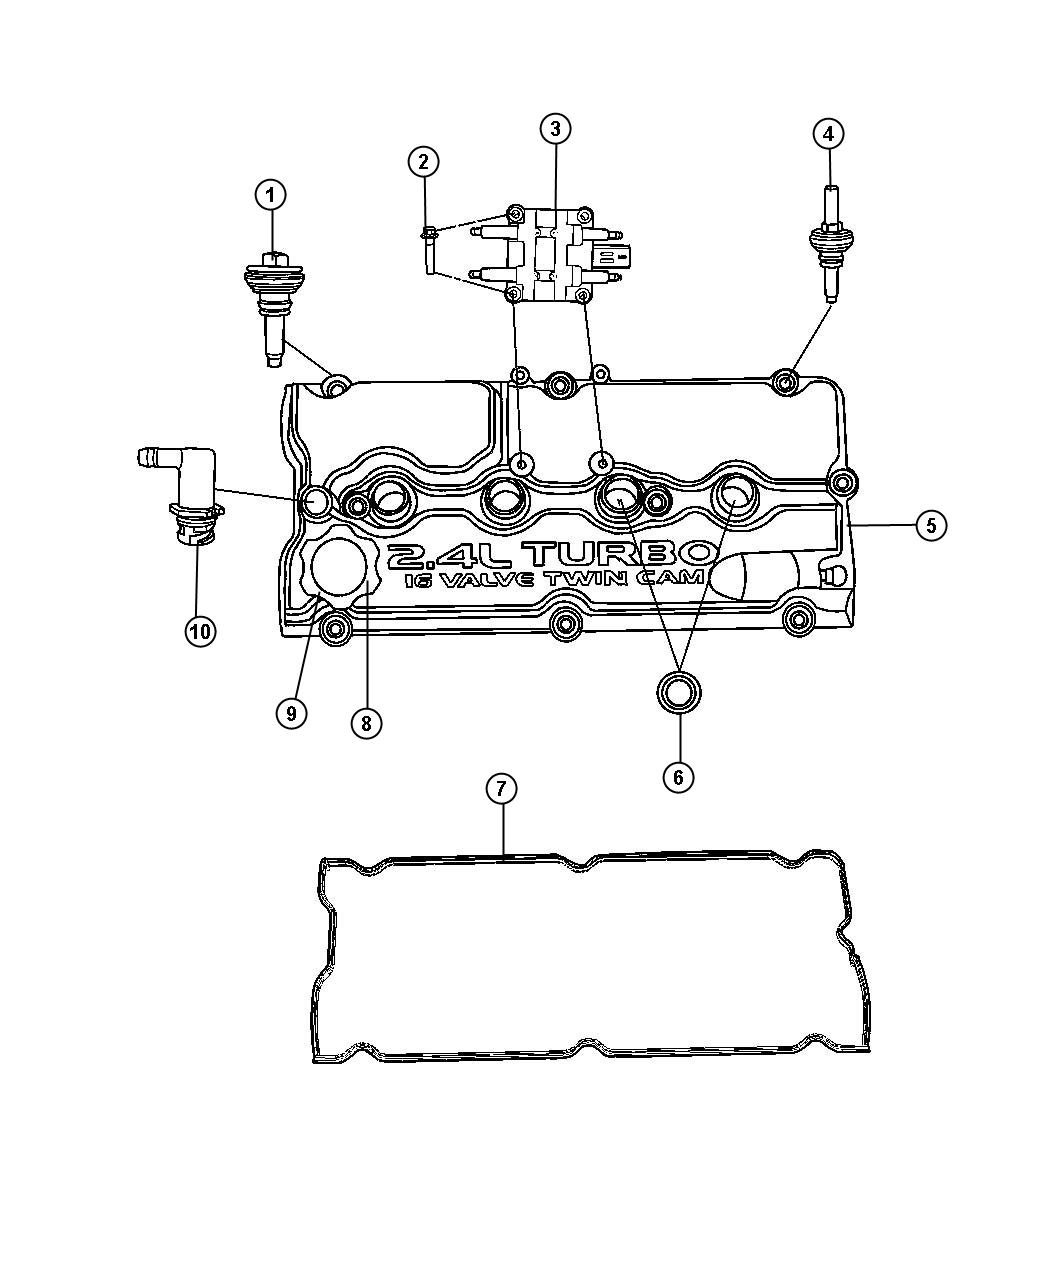 2001 Dodge Stratus Coil. Ignition. Emissions, european